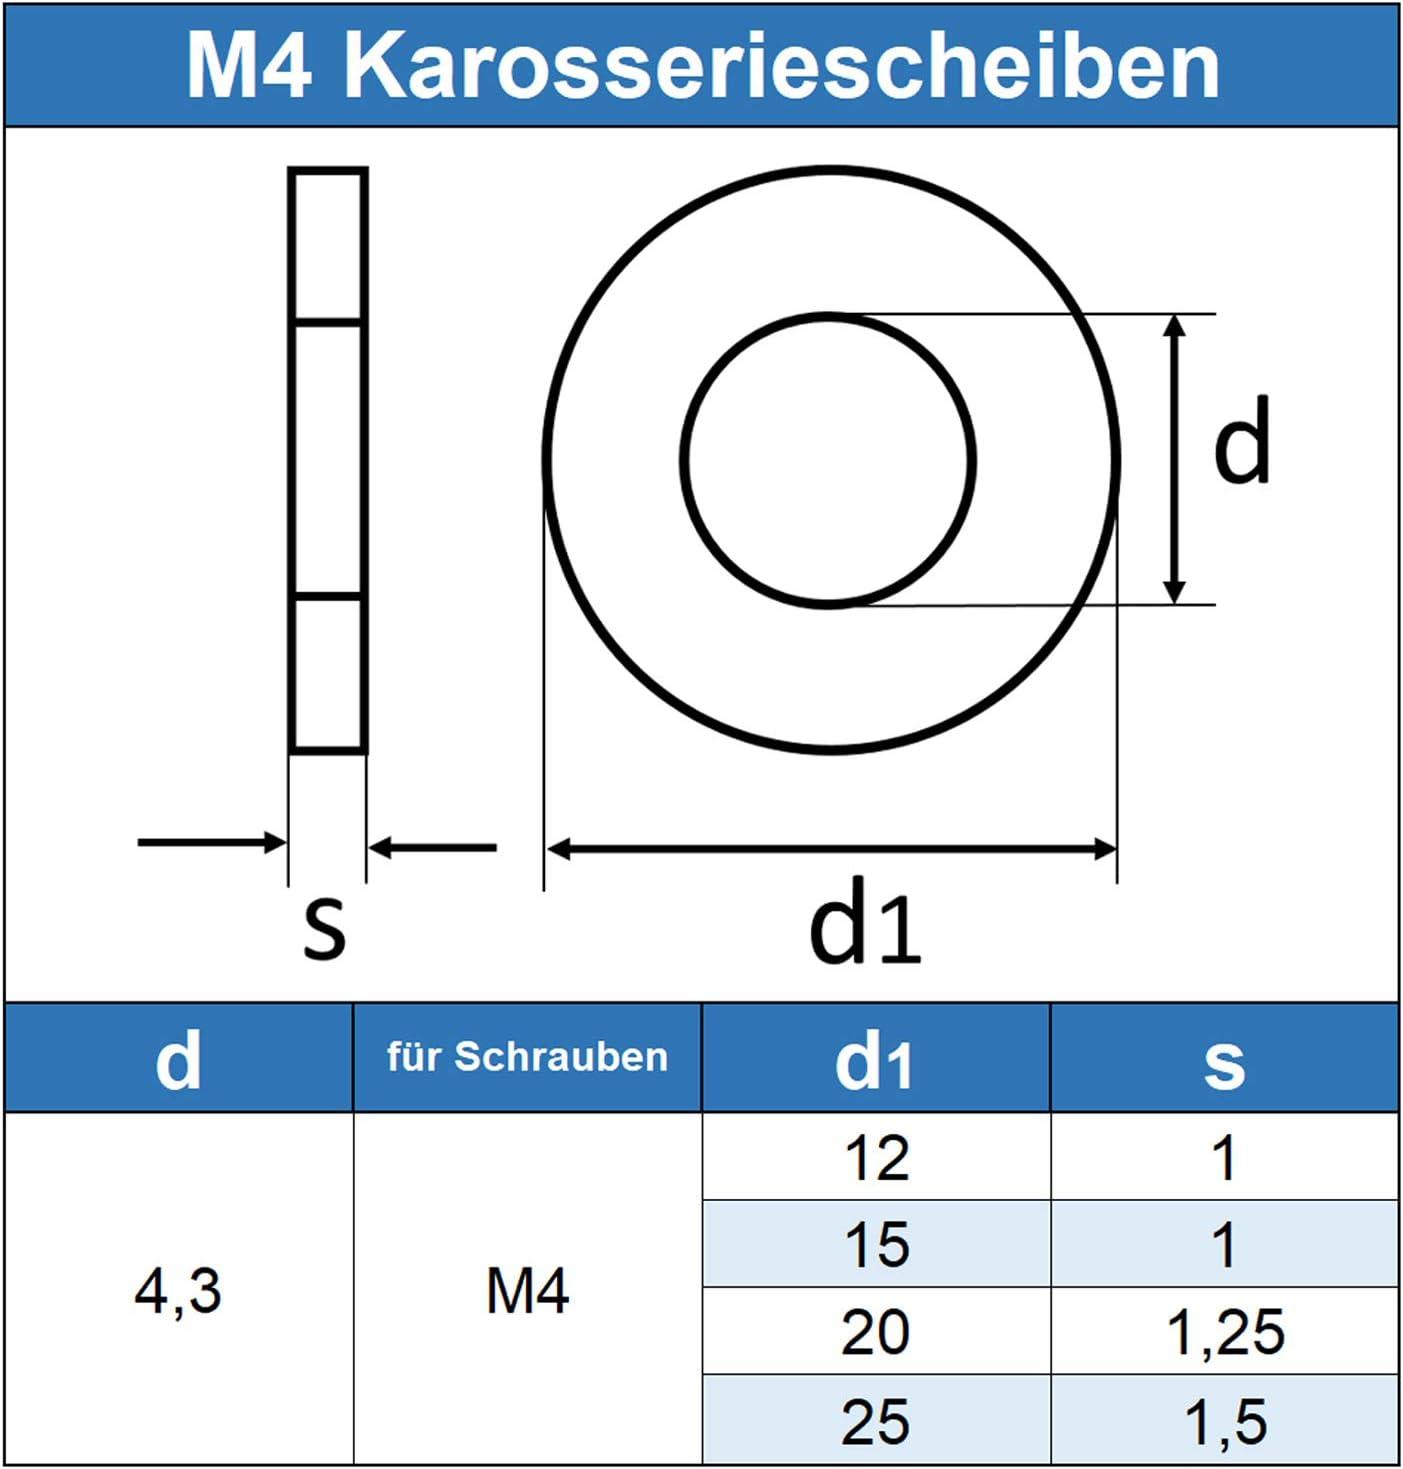 Kotfl/ügelscheiben - Beilagscheiben 10 St/ück Edelstahl A2 V2A M6 Karosseriescheiben 6,4 X 30 mm rostfrei Eisenwaren2000